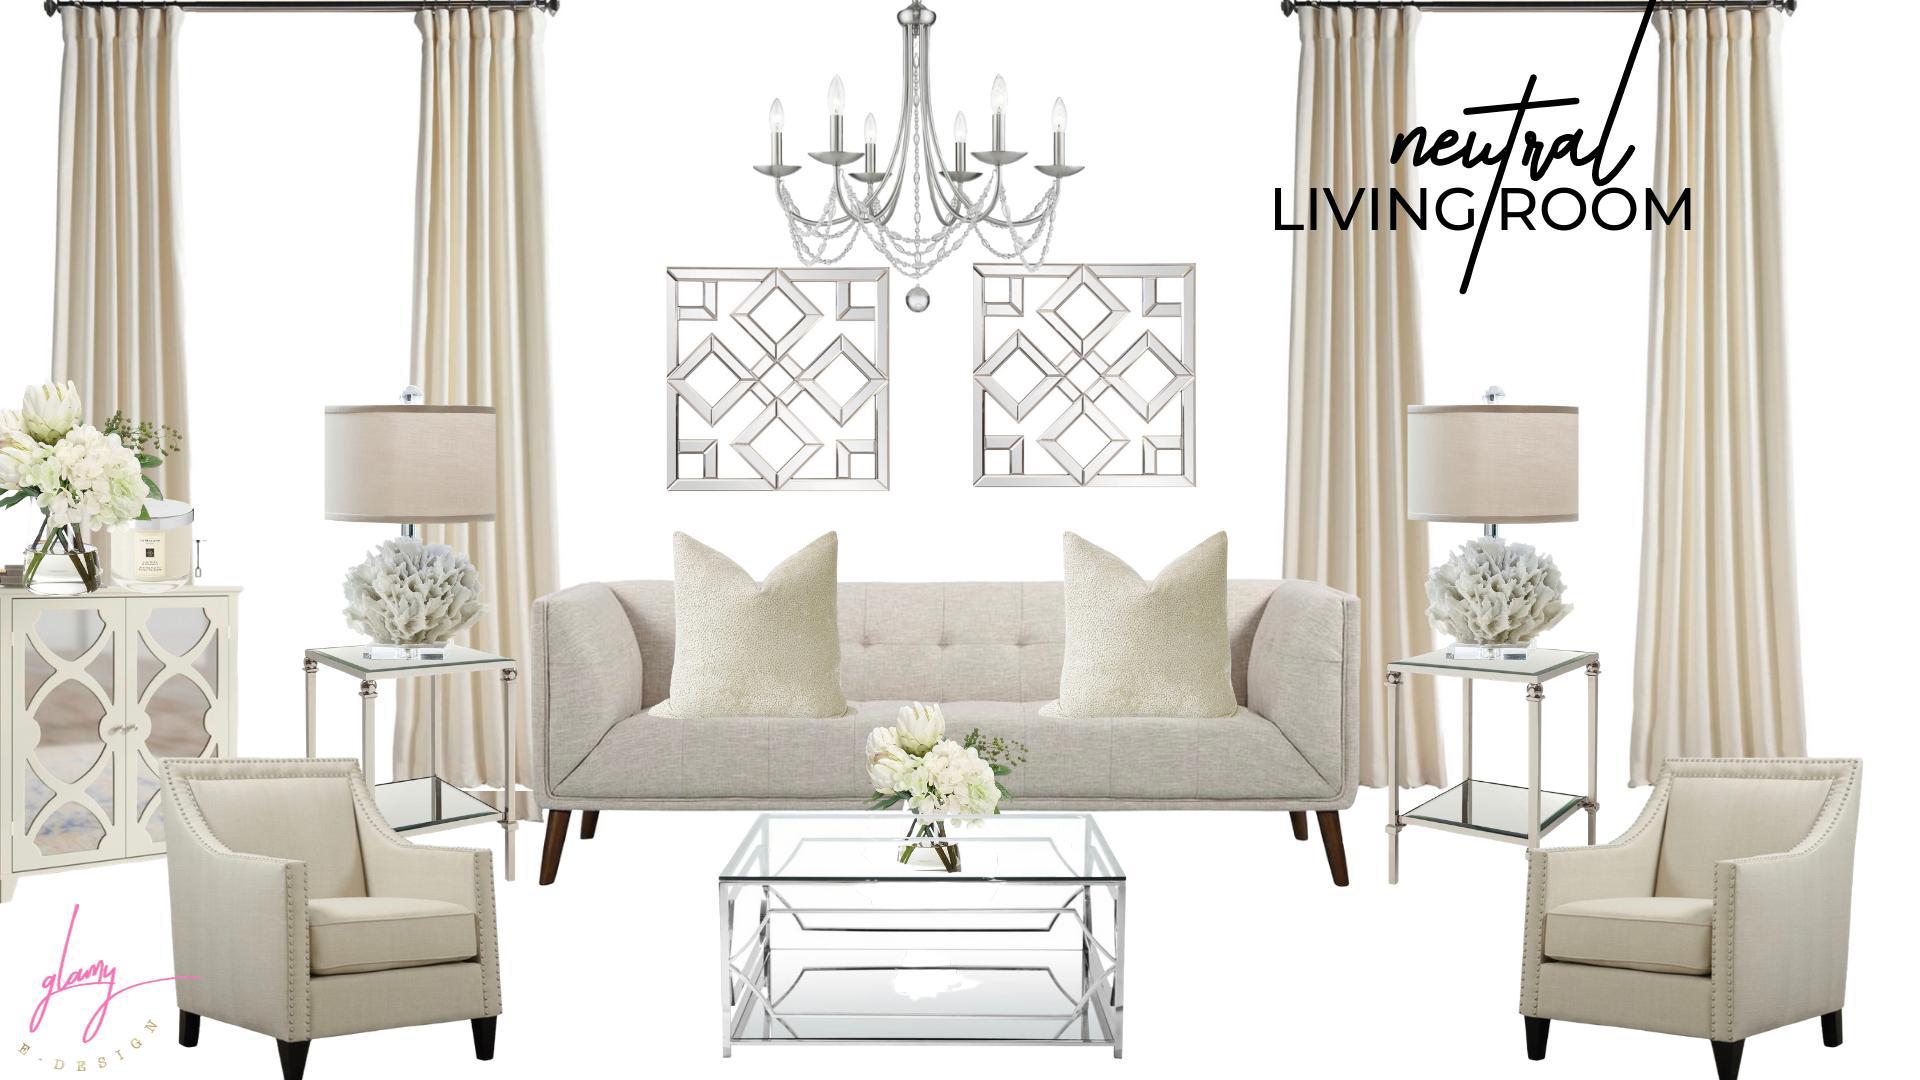 Neutral Living Room Design In 2020 Neutral Living Room Design Neutral Living Room Living Room Goals #warm #neutral #living #room